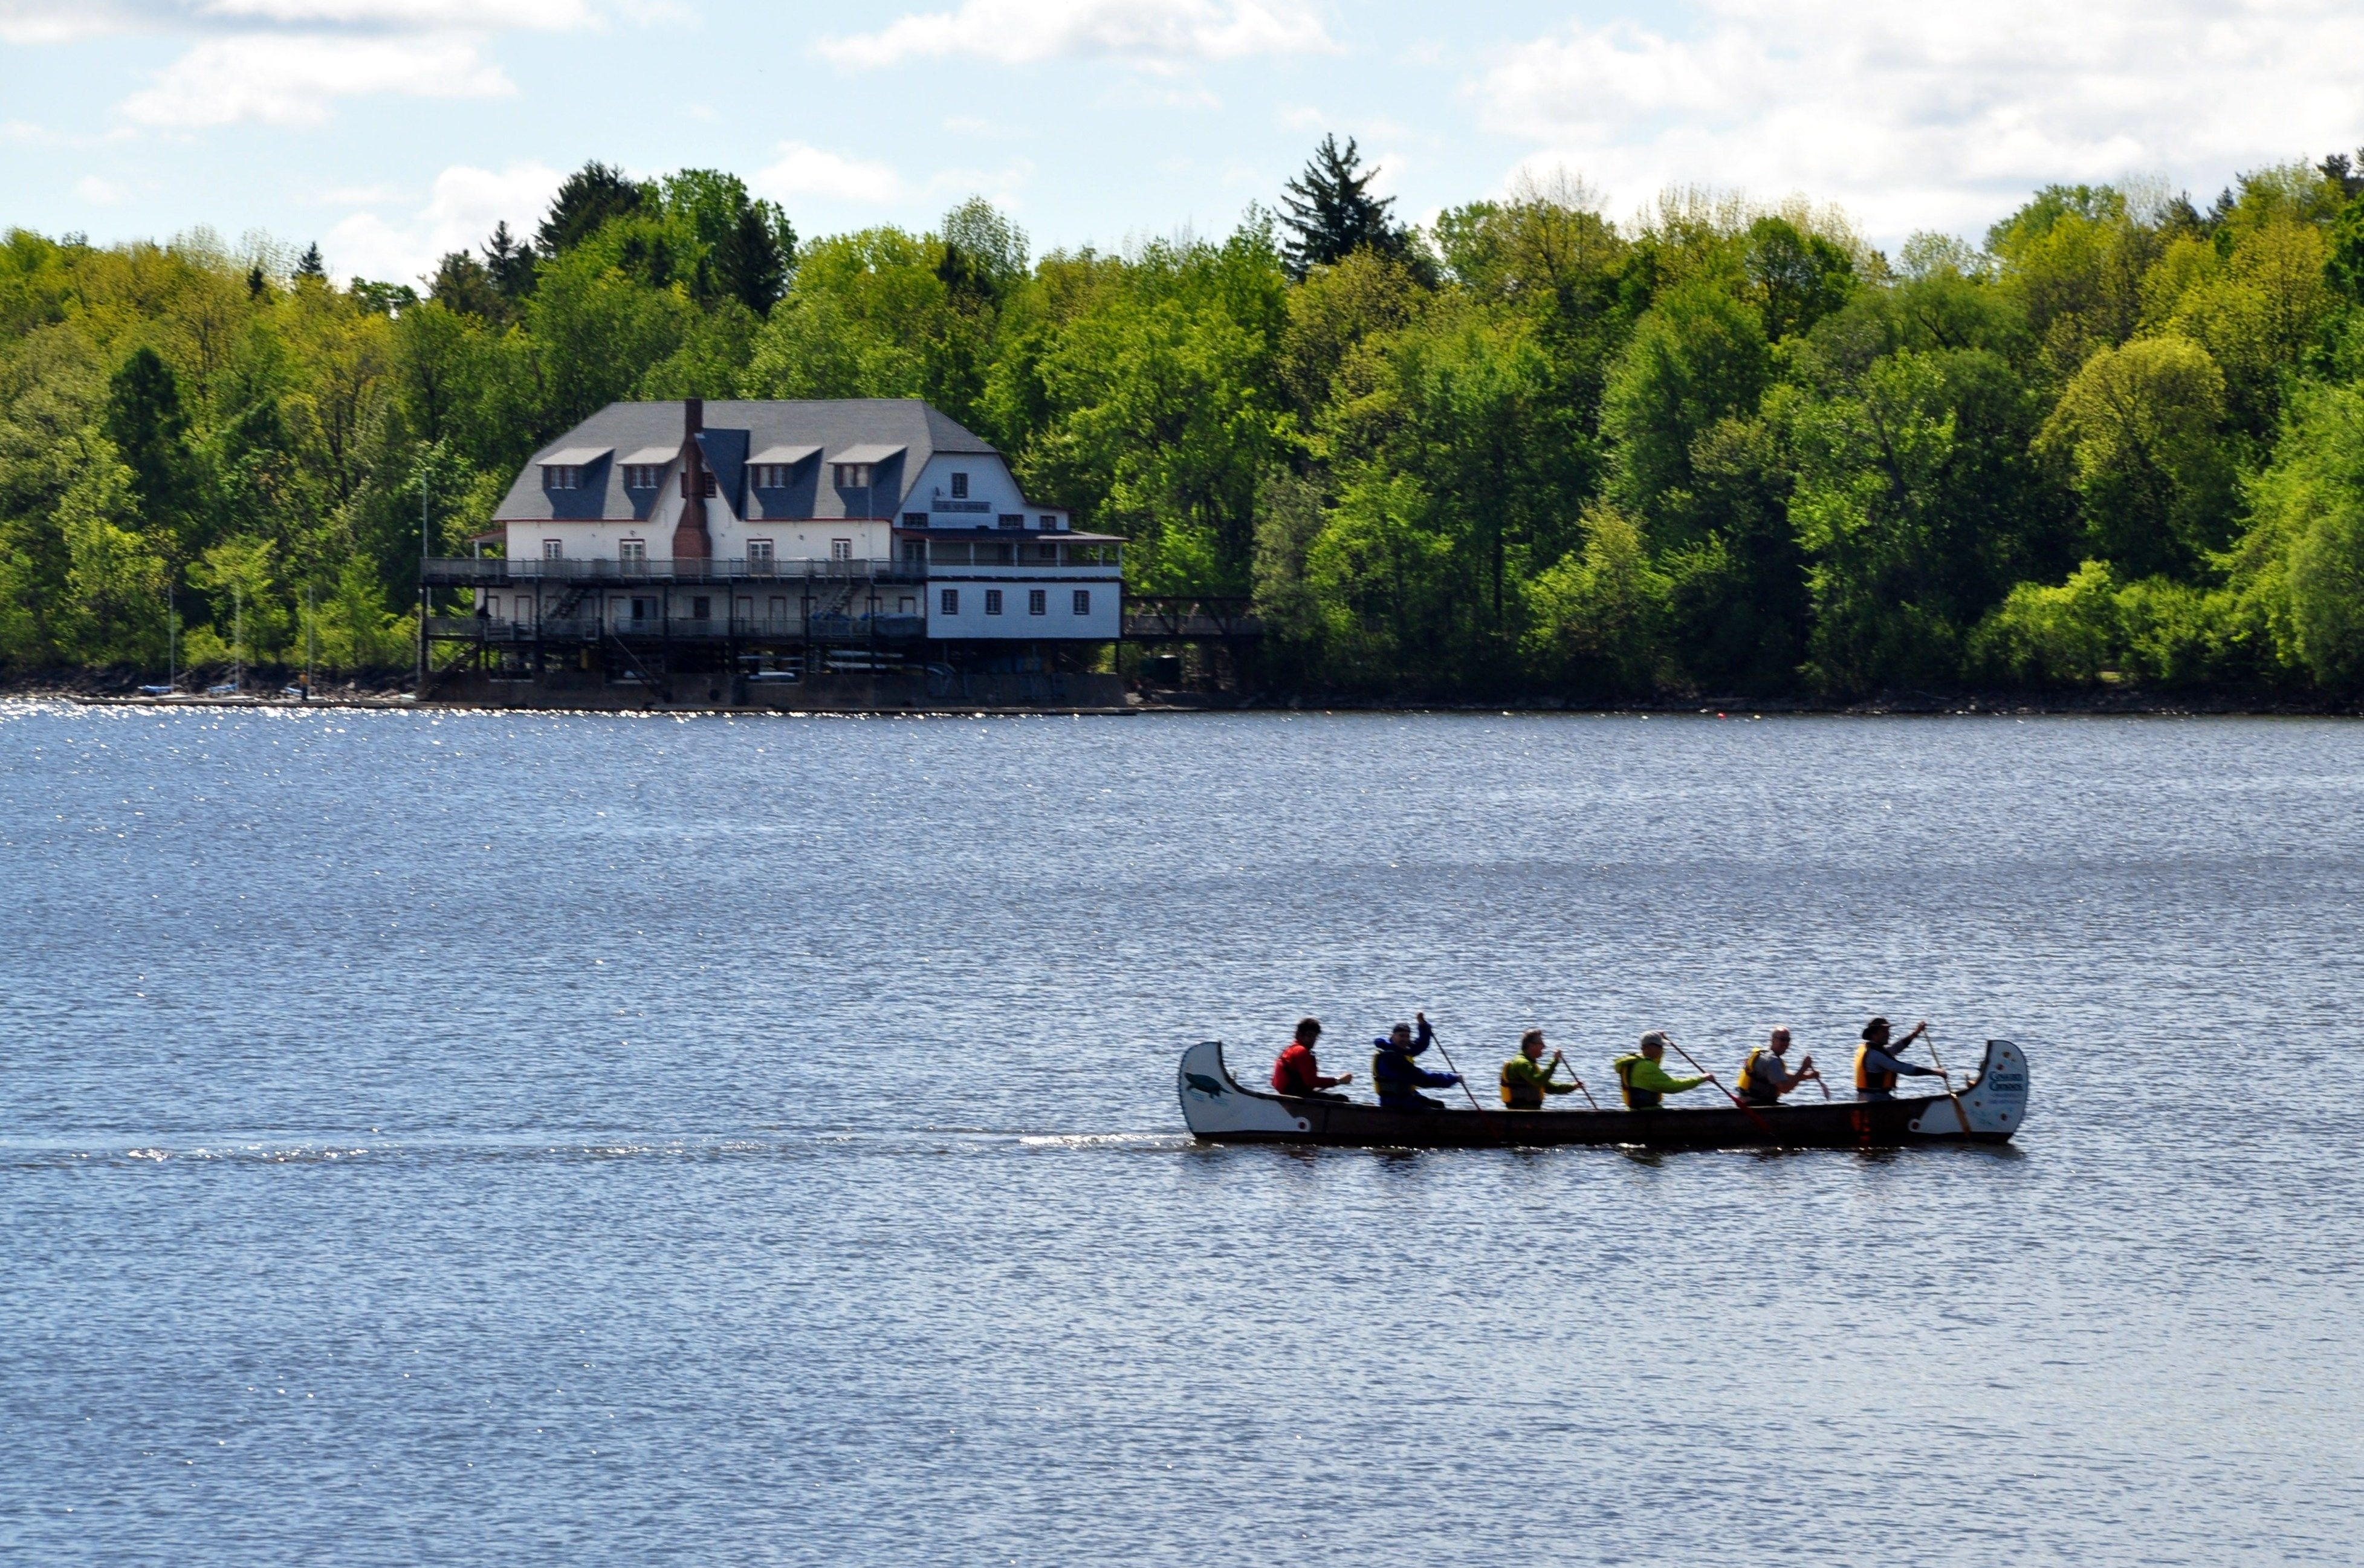 Big Boathouse Canoe & Social Club